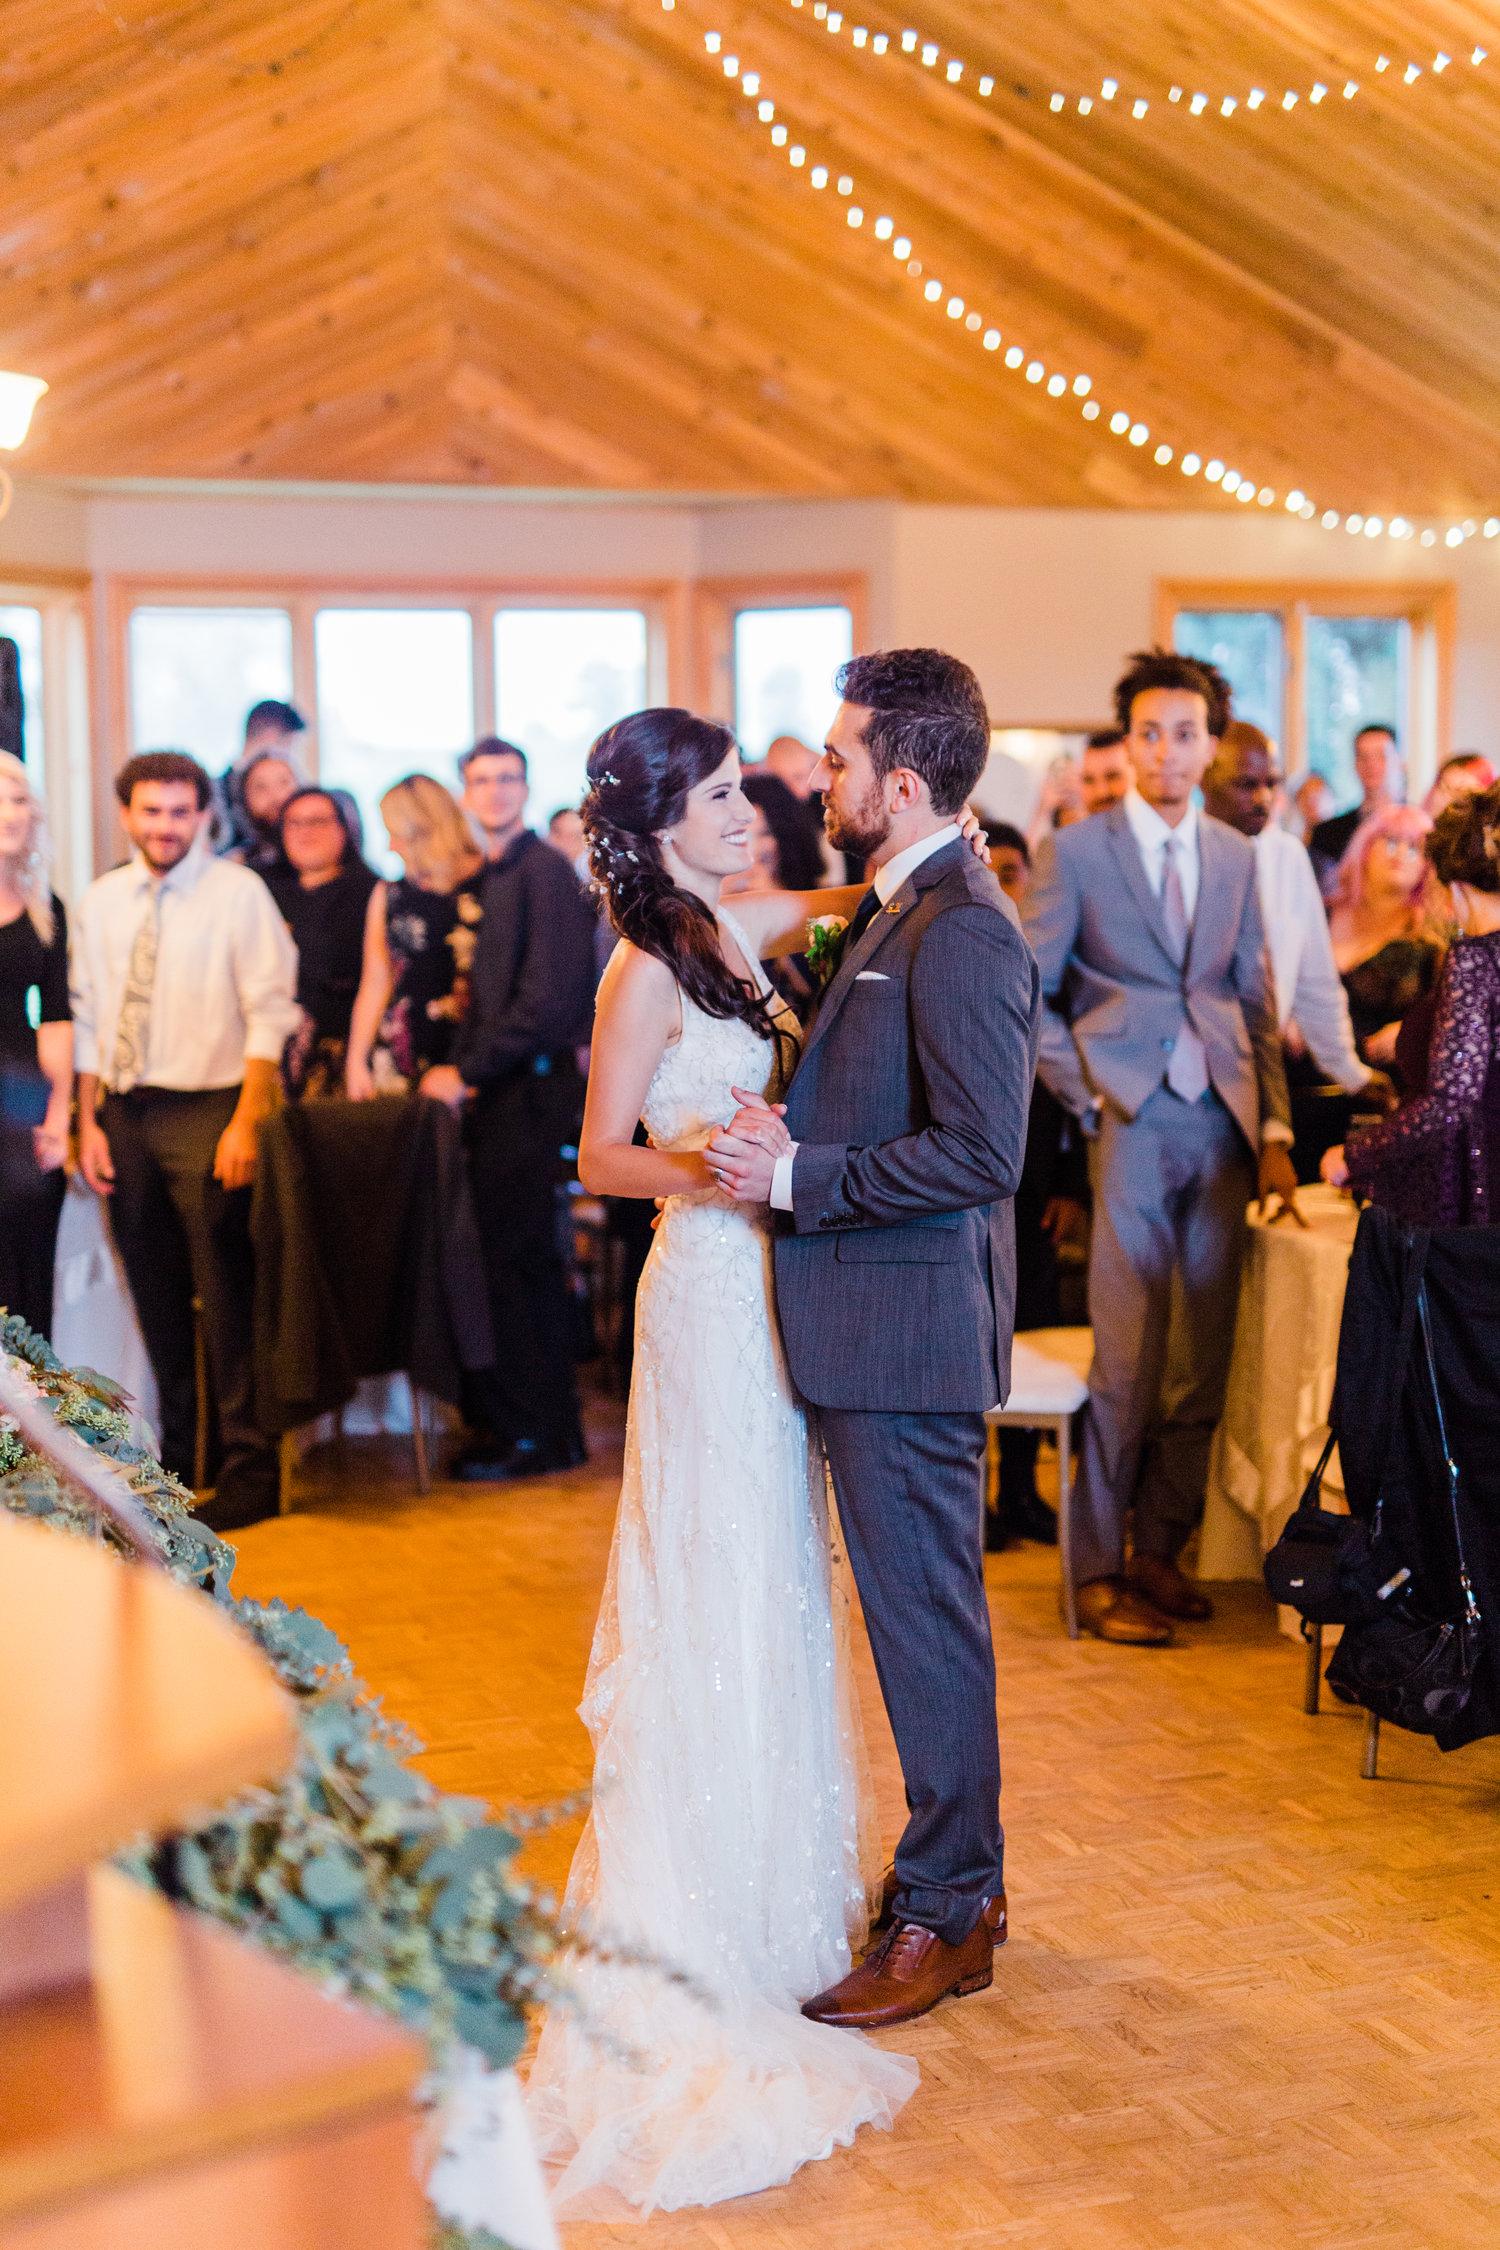 Amir-Golbazi-Danielle-Giroux-Photography_Toronto-Wedding_Cedarwood_Rachel-Paul_584.jpg